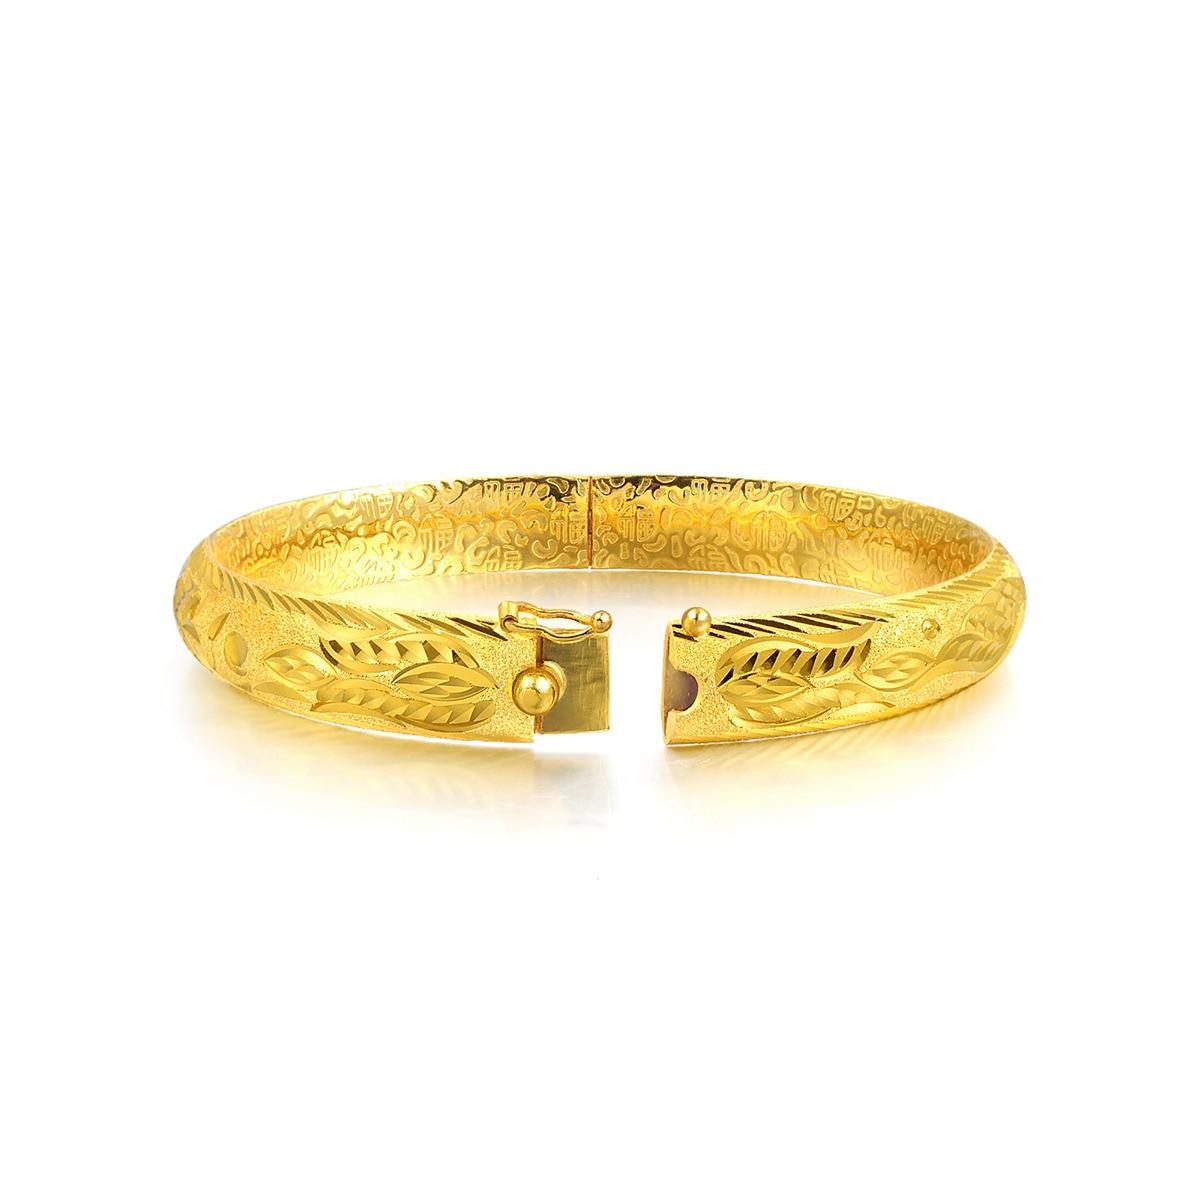 9999 Gold Dragon Phoenix Bangle Chow Sang Sang Jewellery eShop